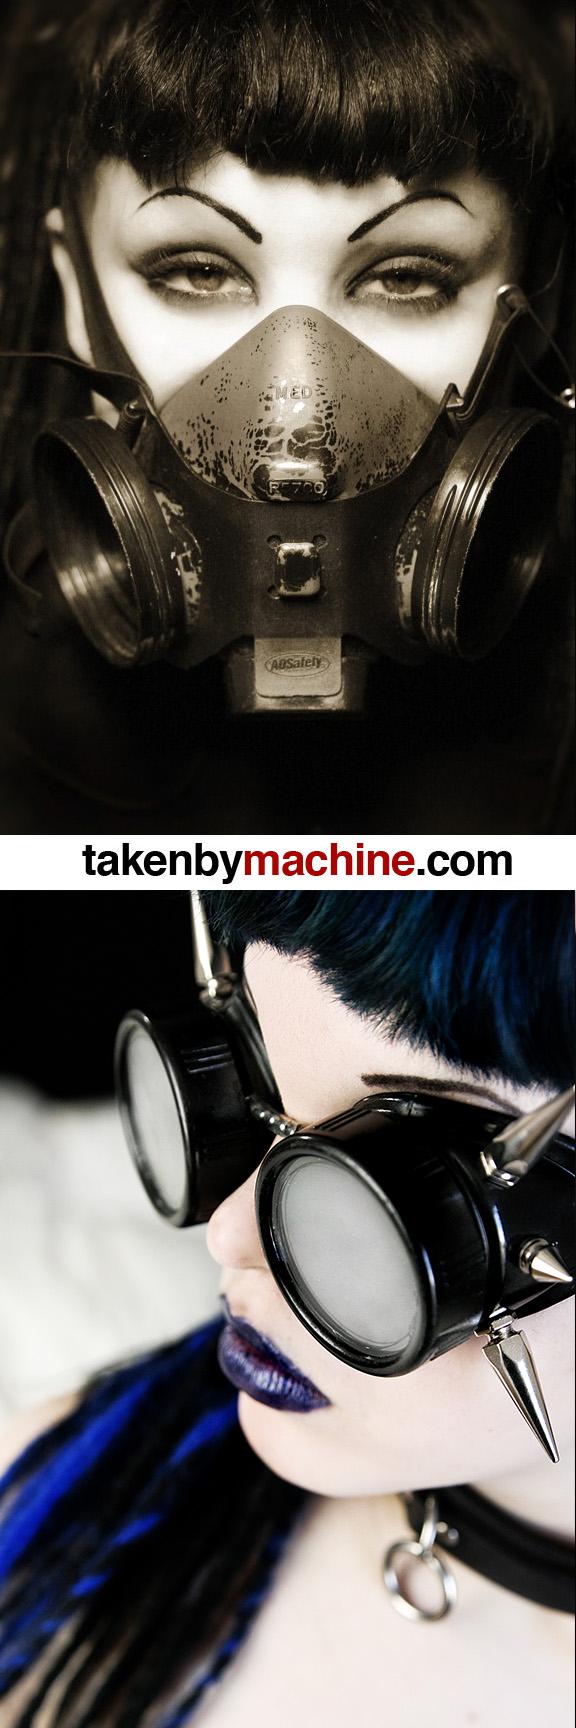 Seattle, WA Jan 27, 2008 2007 - Machine - takenbymachine.com Orpheus Faust